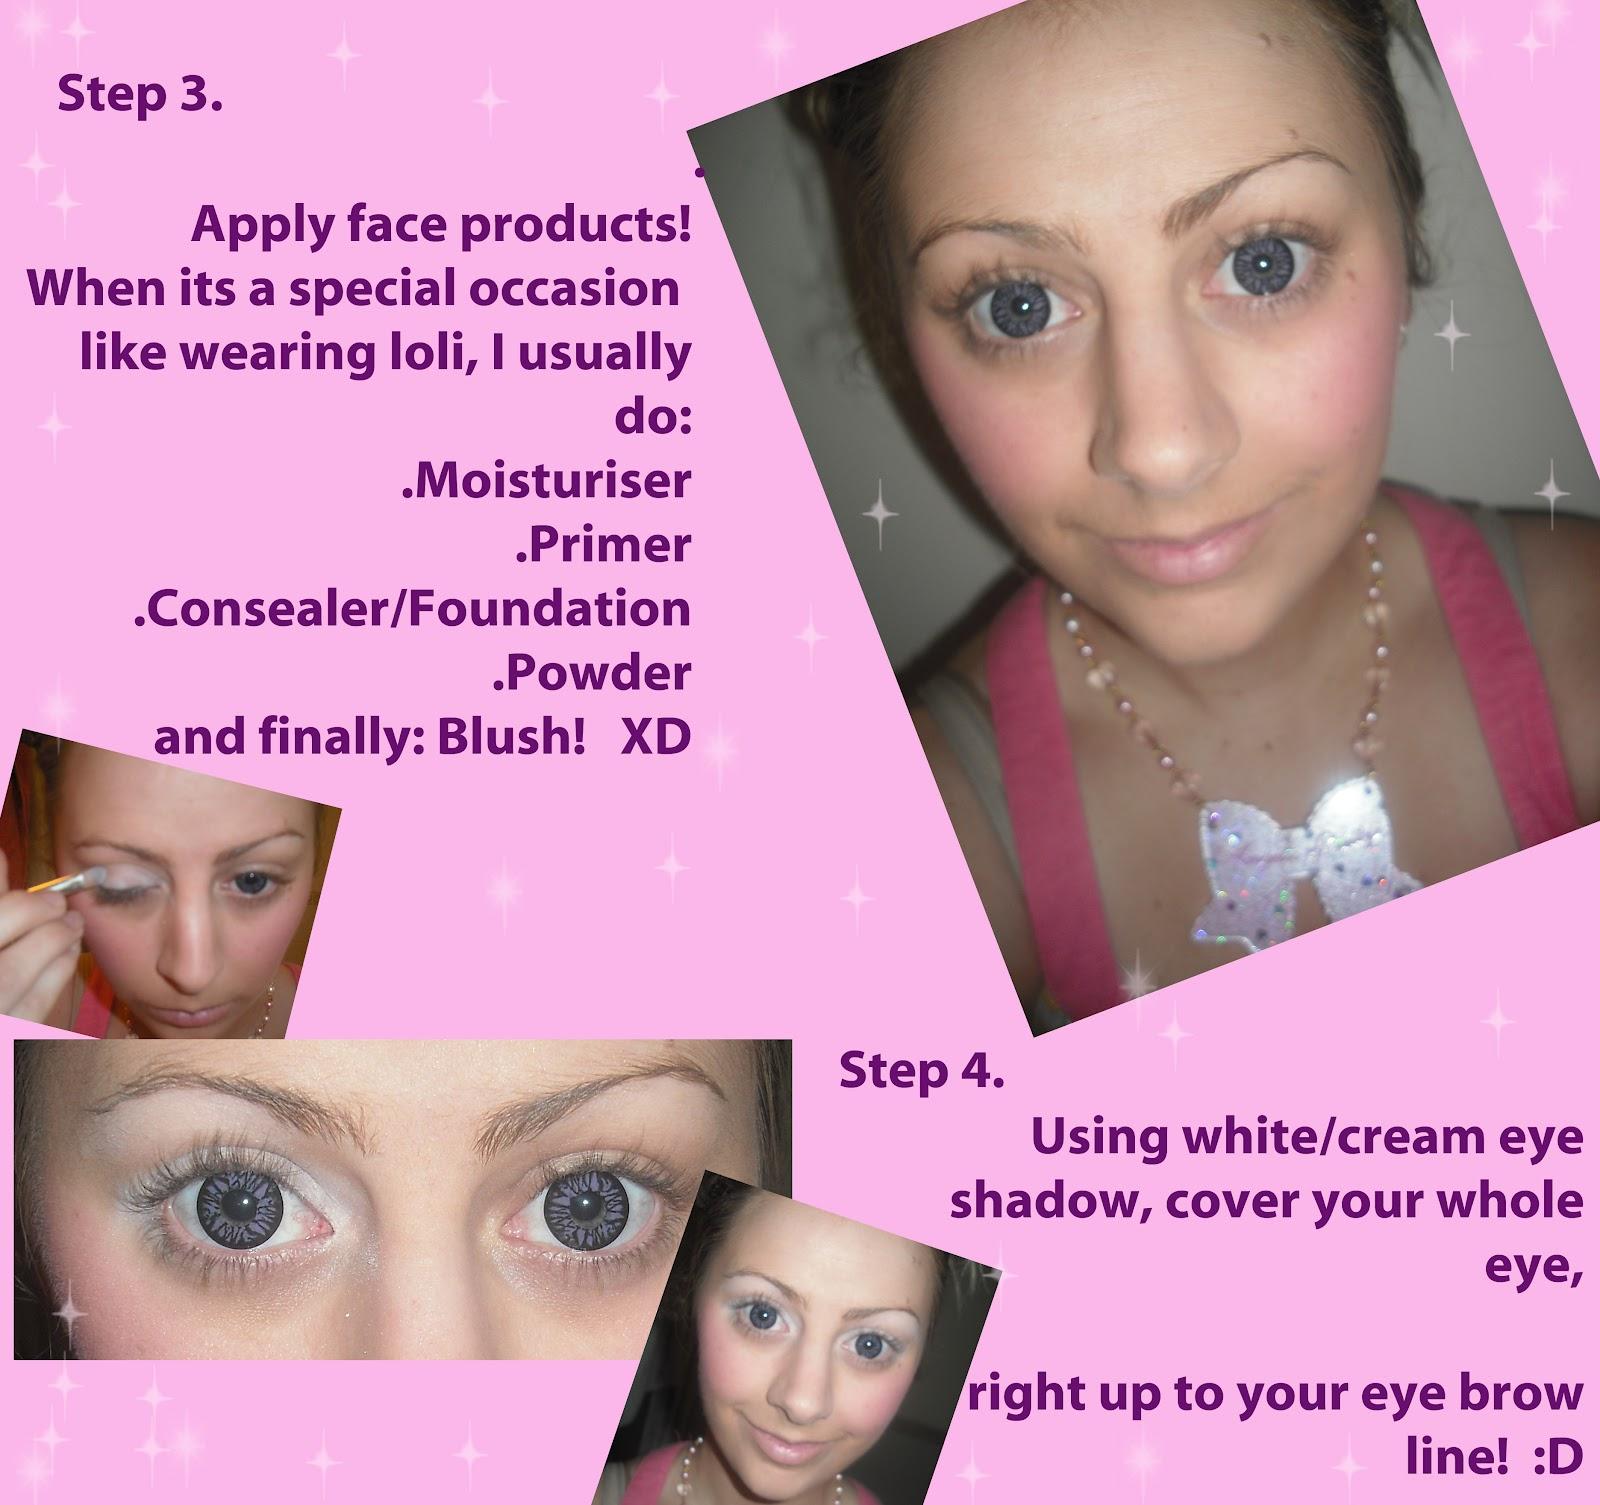 http://3.bp.blogspot.com/-yHYoEPzJ4Kg/UB9jVZFfWmI/AAAAAAAABFA/Q7fi3yFx1oY/s1600/Lolita+Makeup+3.jpg